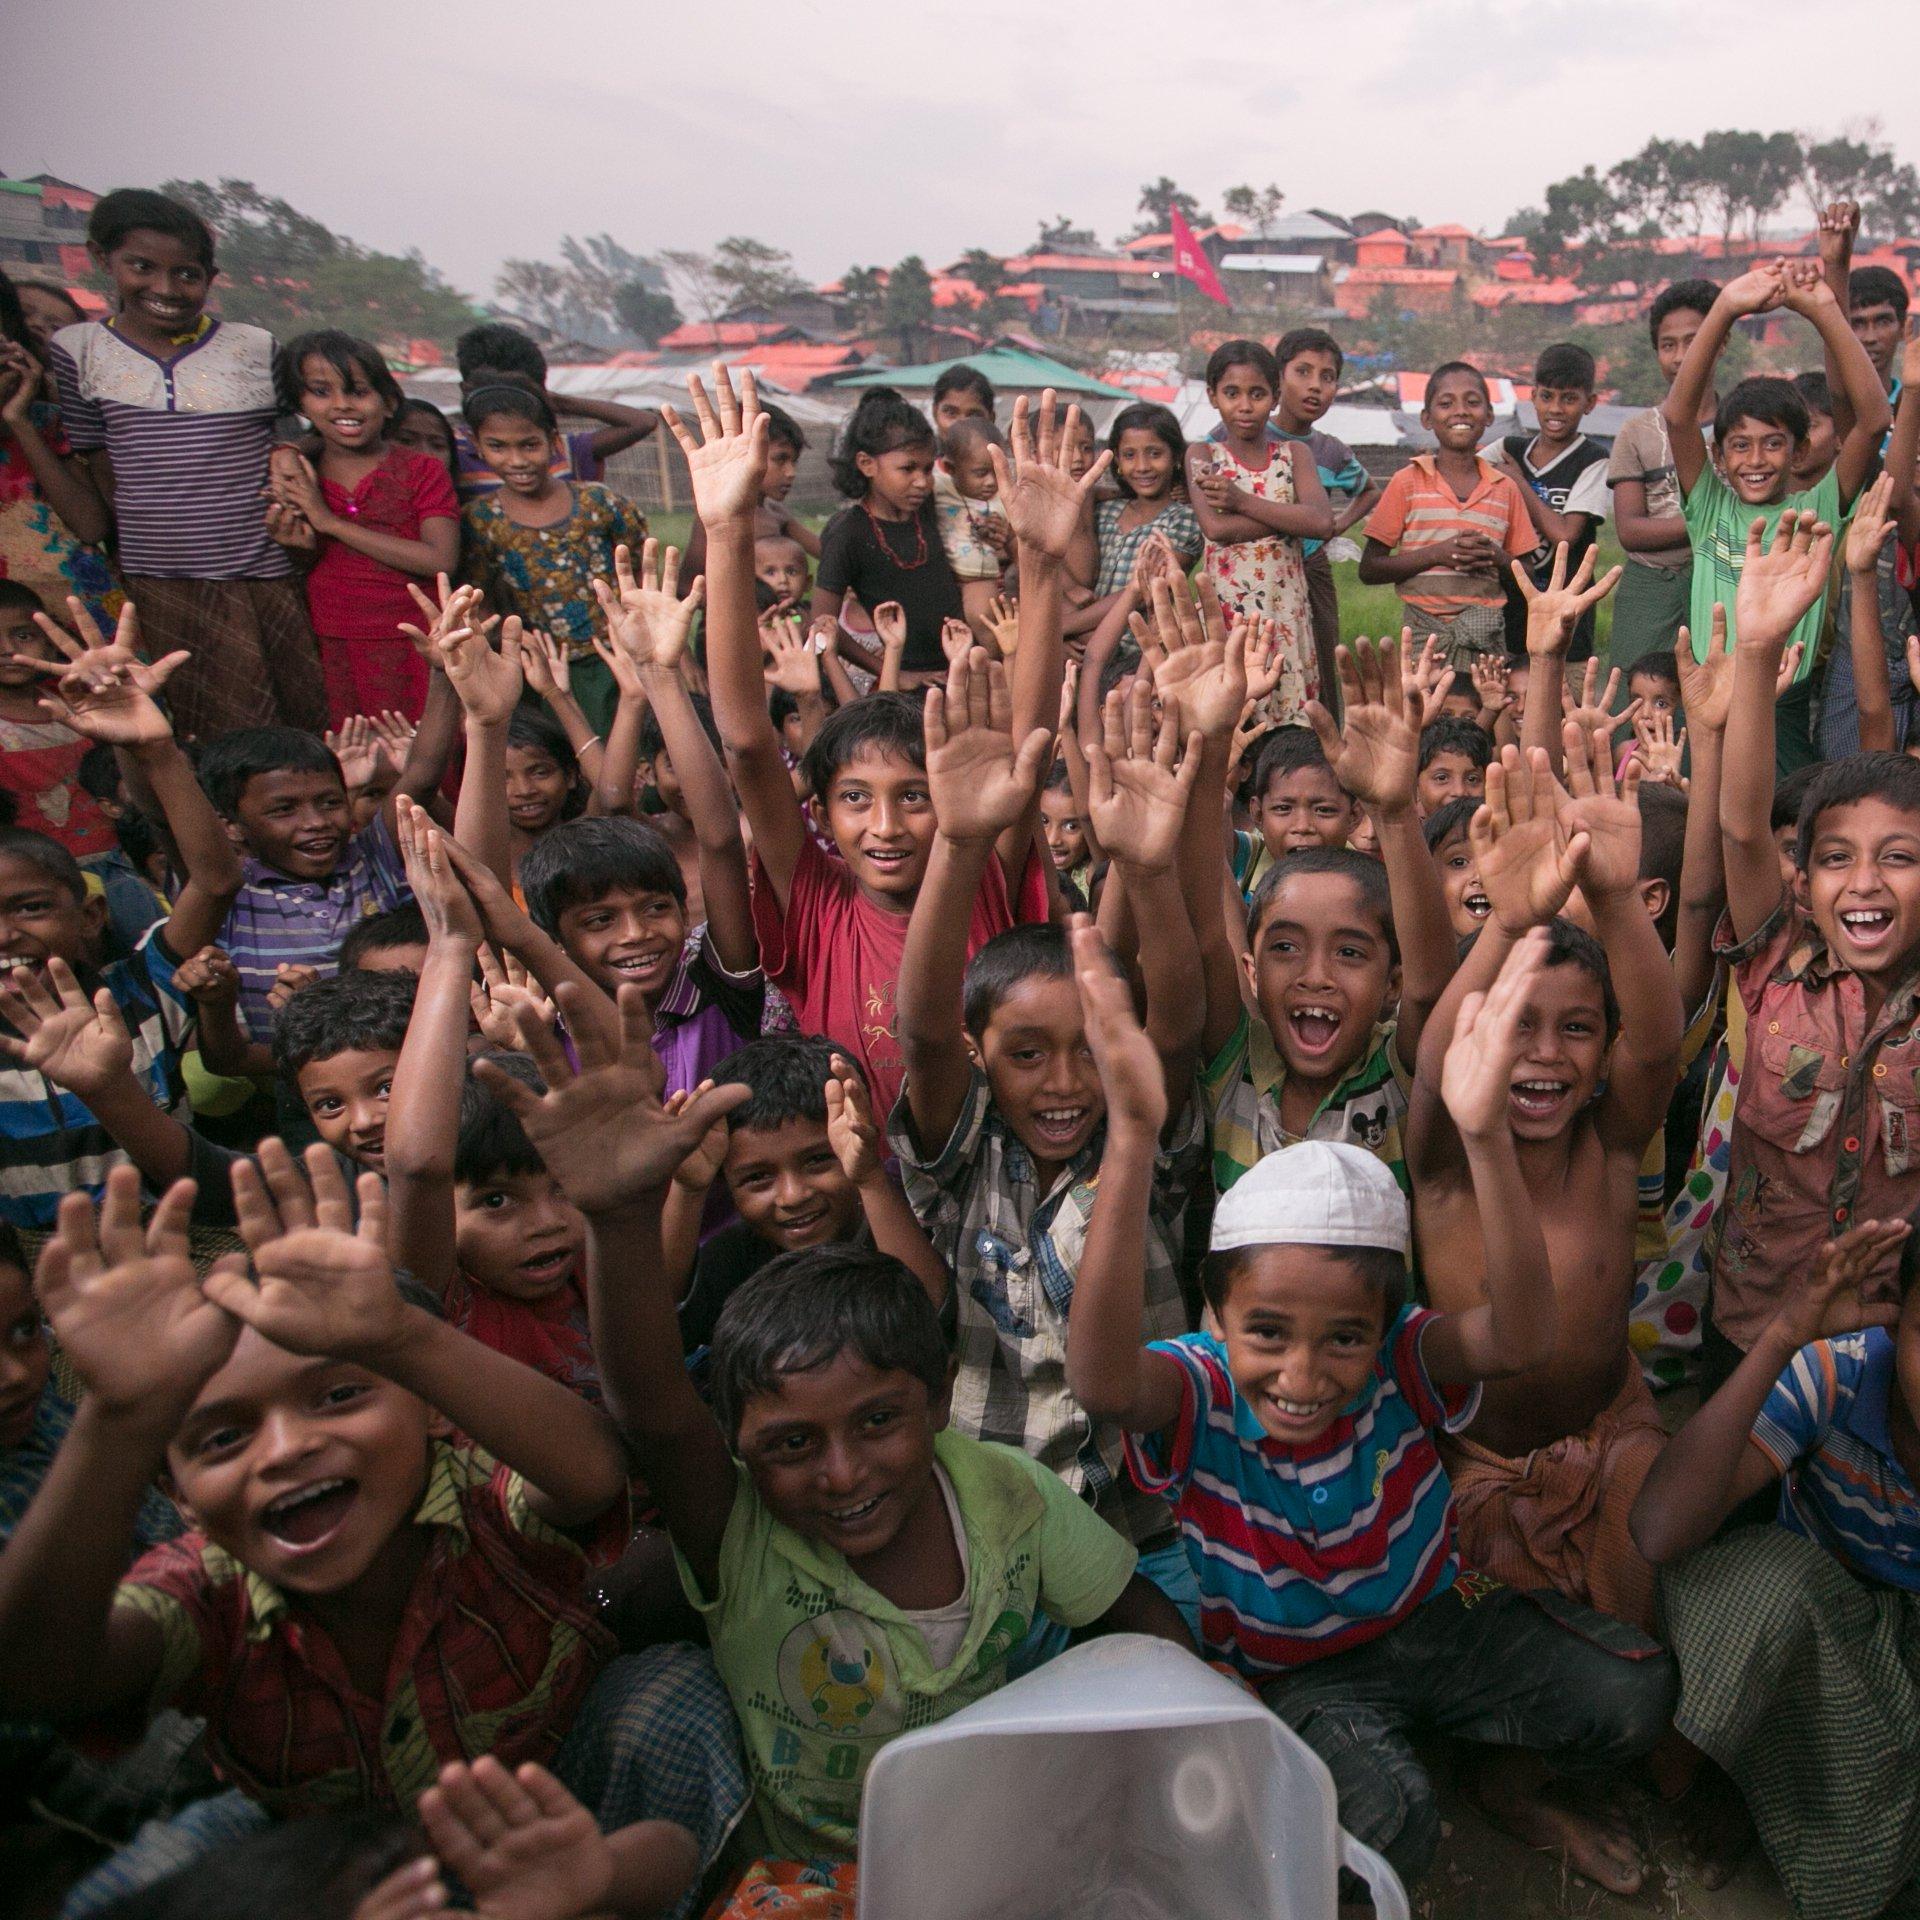 OBATHelpers-rohingya-refugee-children-bangladesh.jpg